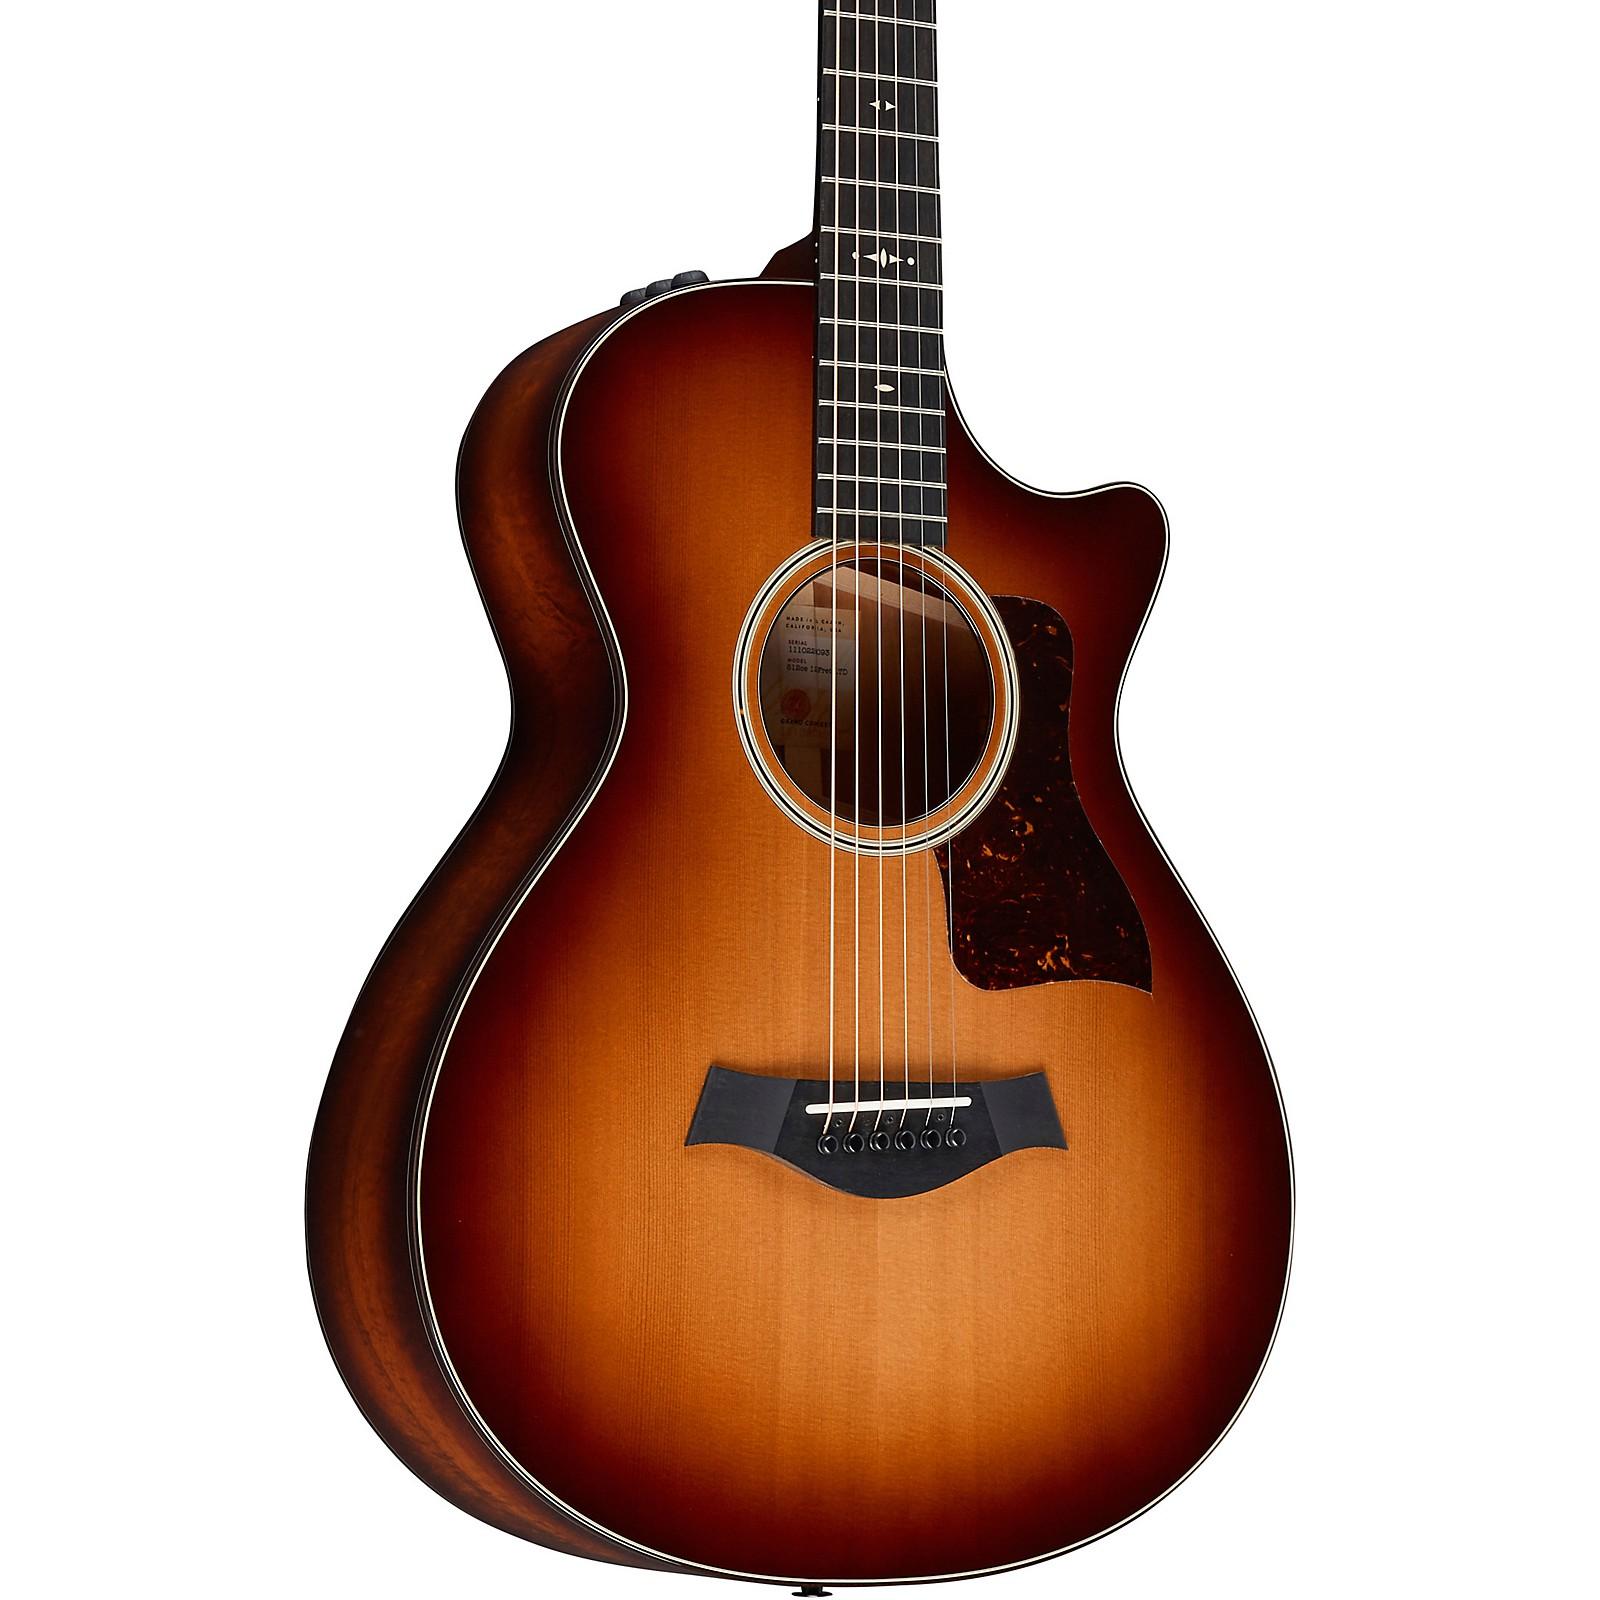 Taylor 512ce 12-Fret Koa Limited Edition Grand Concert Acoustic Electric Guitar